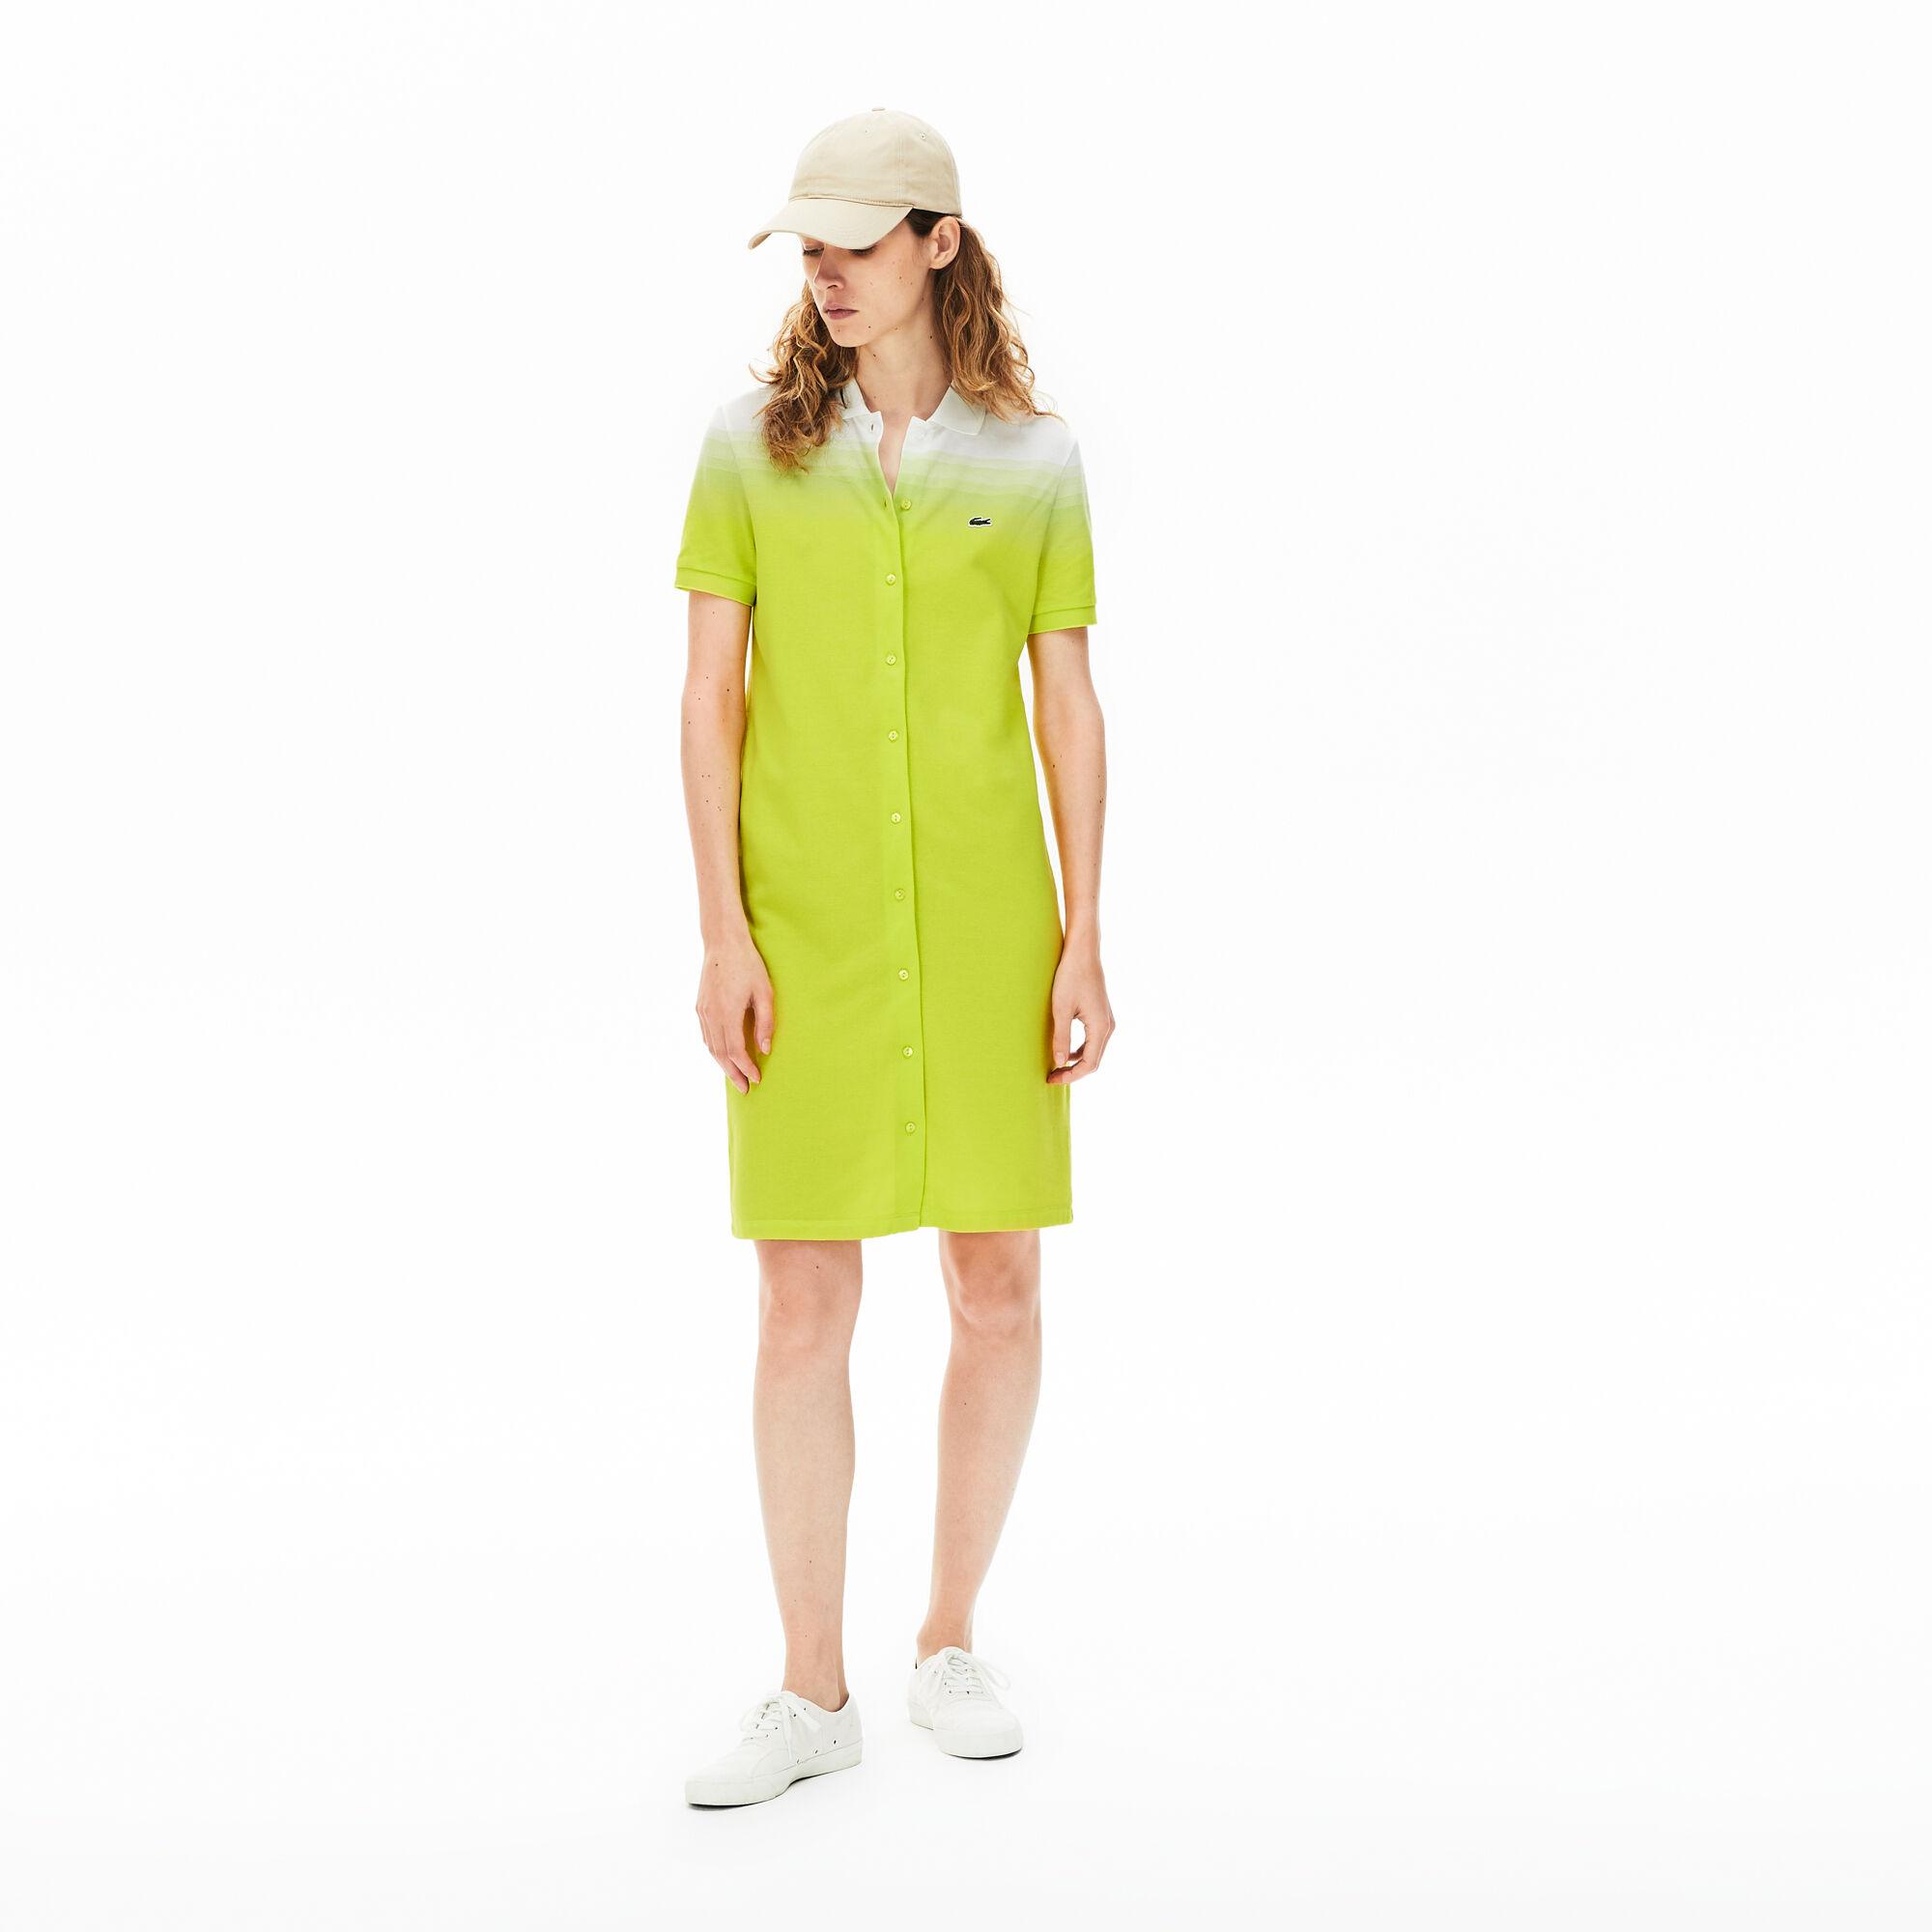 Women's Made in France Cotton Piqué Polo Dress